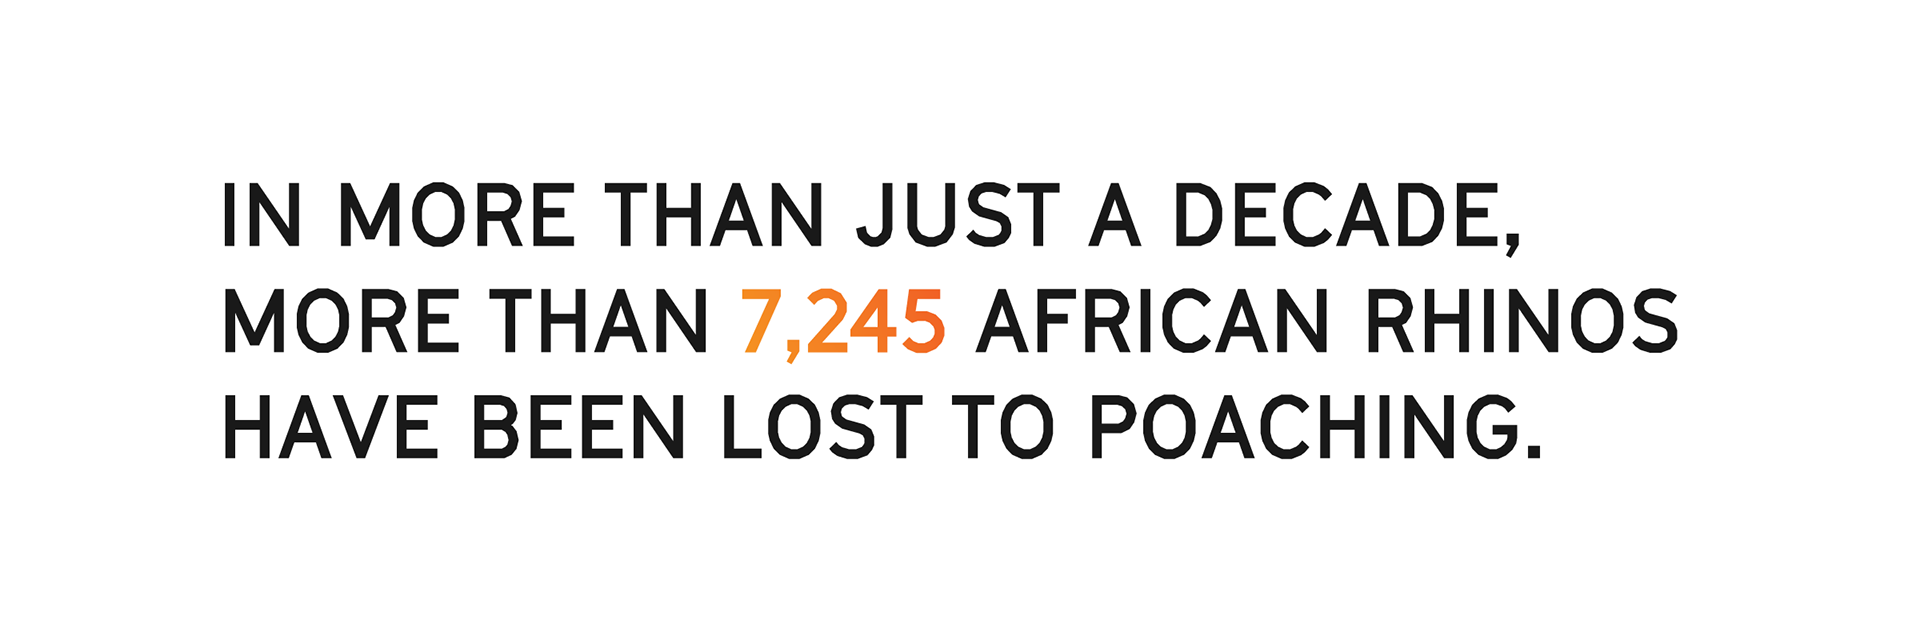 3658e5ec-1097-4dc7-a740-d54af38533b0_rw_1920